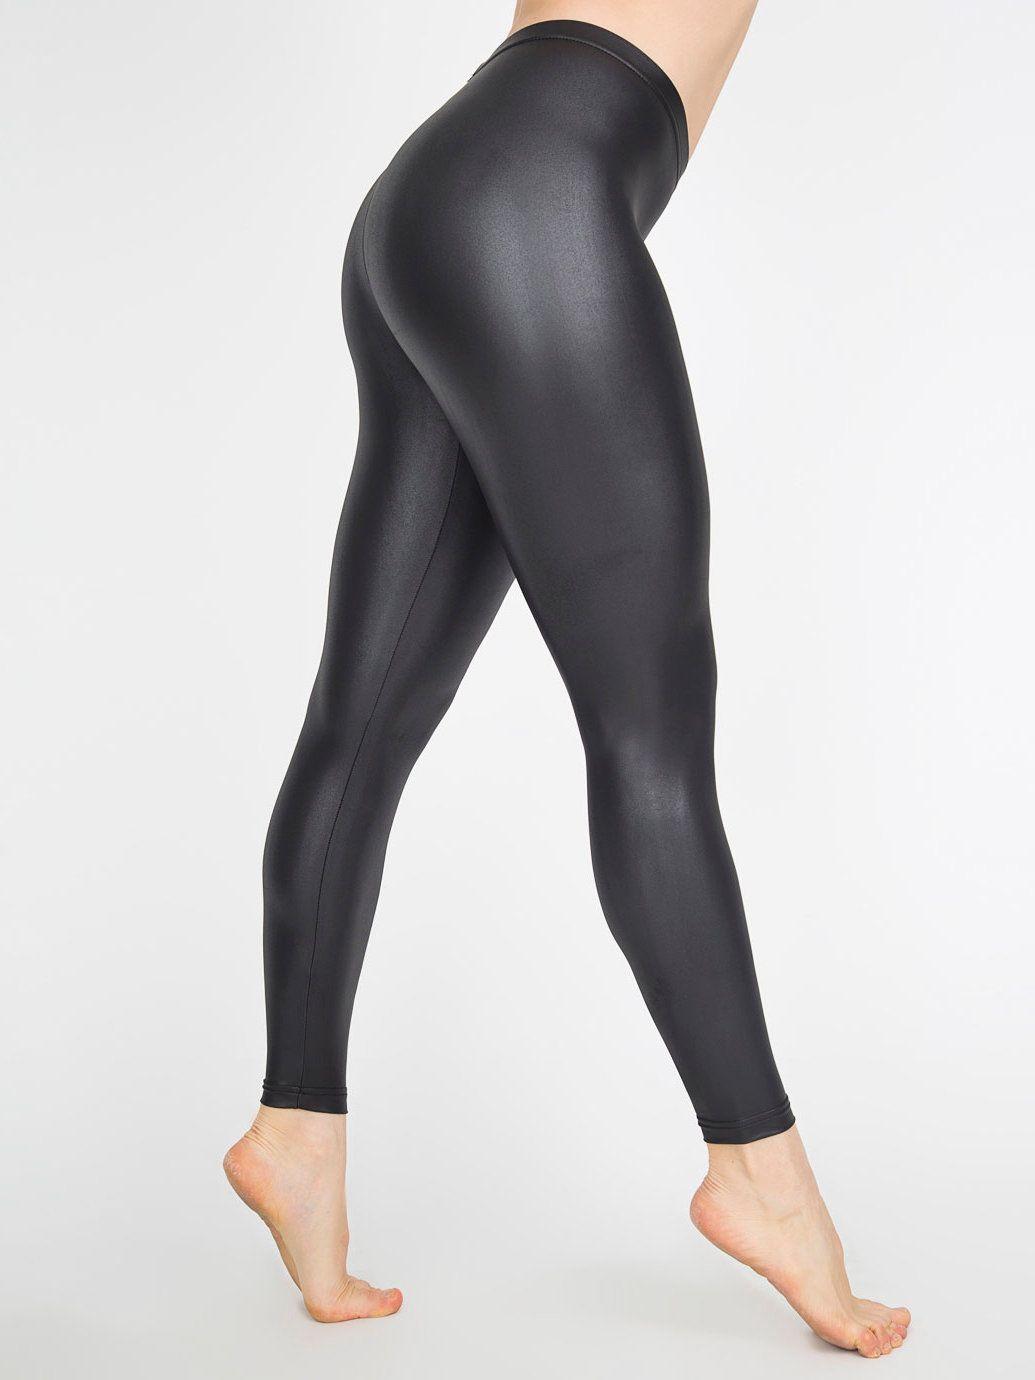 shiny legging sundancers shiny leggings leggings are